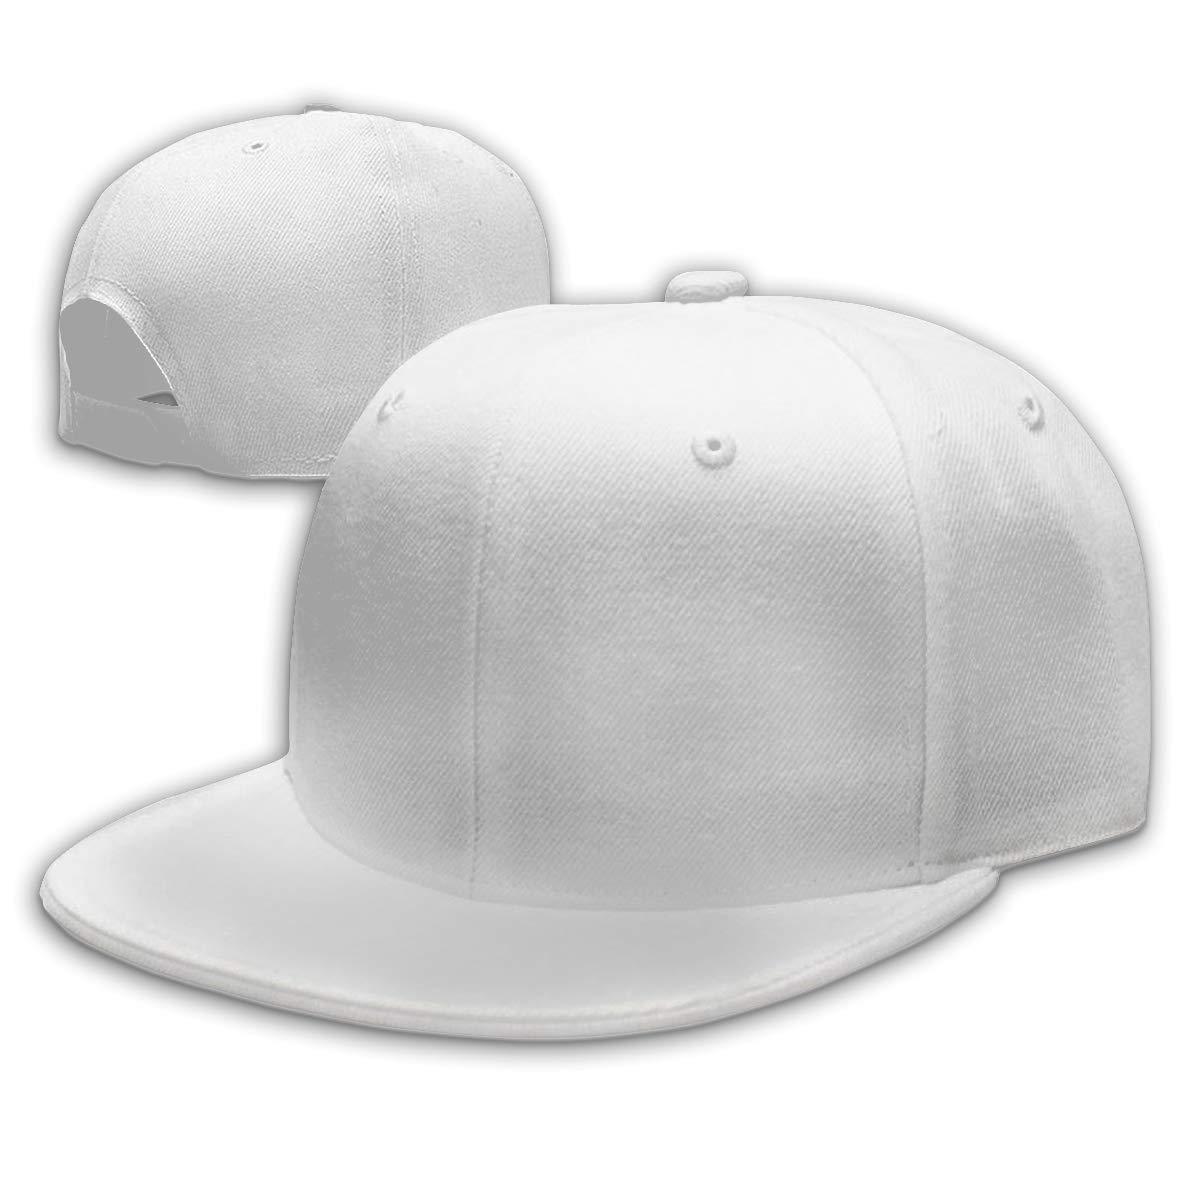 Verstellbar Unisex Damen Herren Cap Classic Alter-Bridge Logo Snapback Mode Baseball Cap Flatbrim M/ütze f/ür Jungen M/ädchen Basecap Baseballcap Black